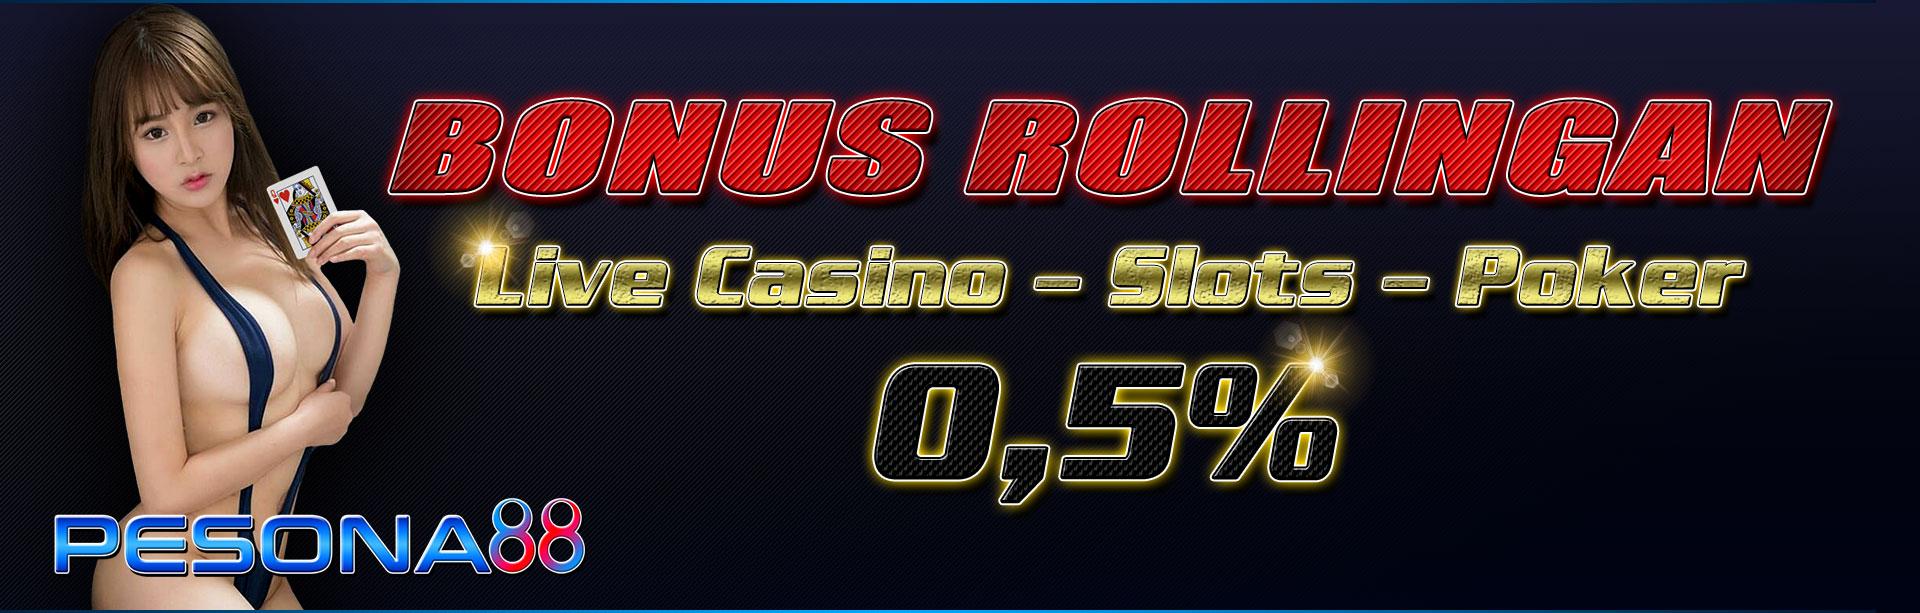 Bonus Rollingan Live Casino, Slots, Poker